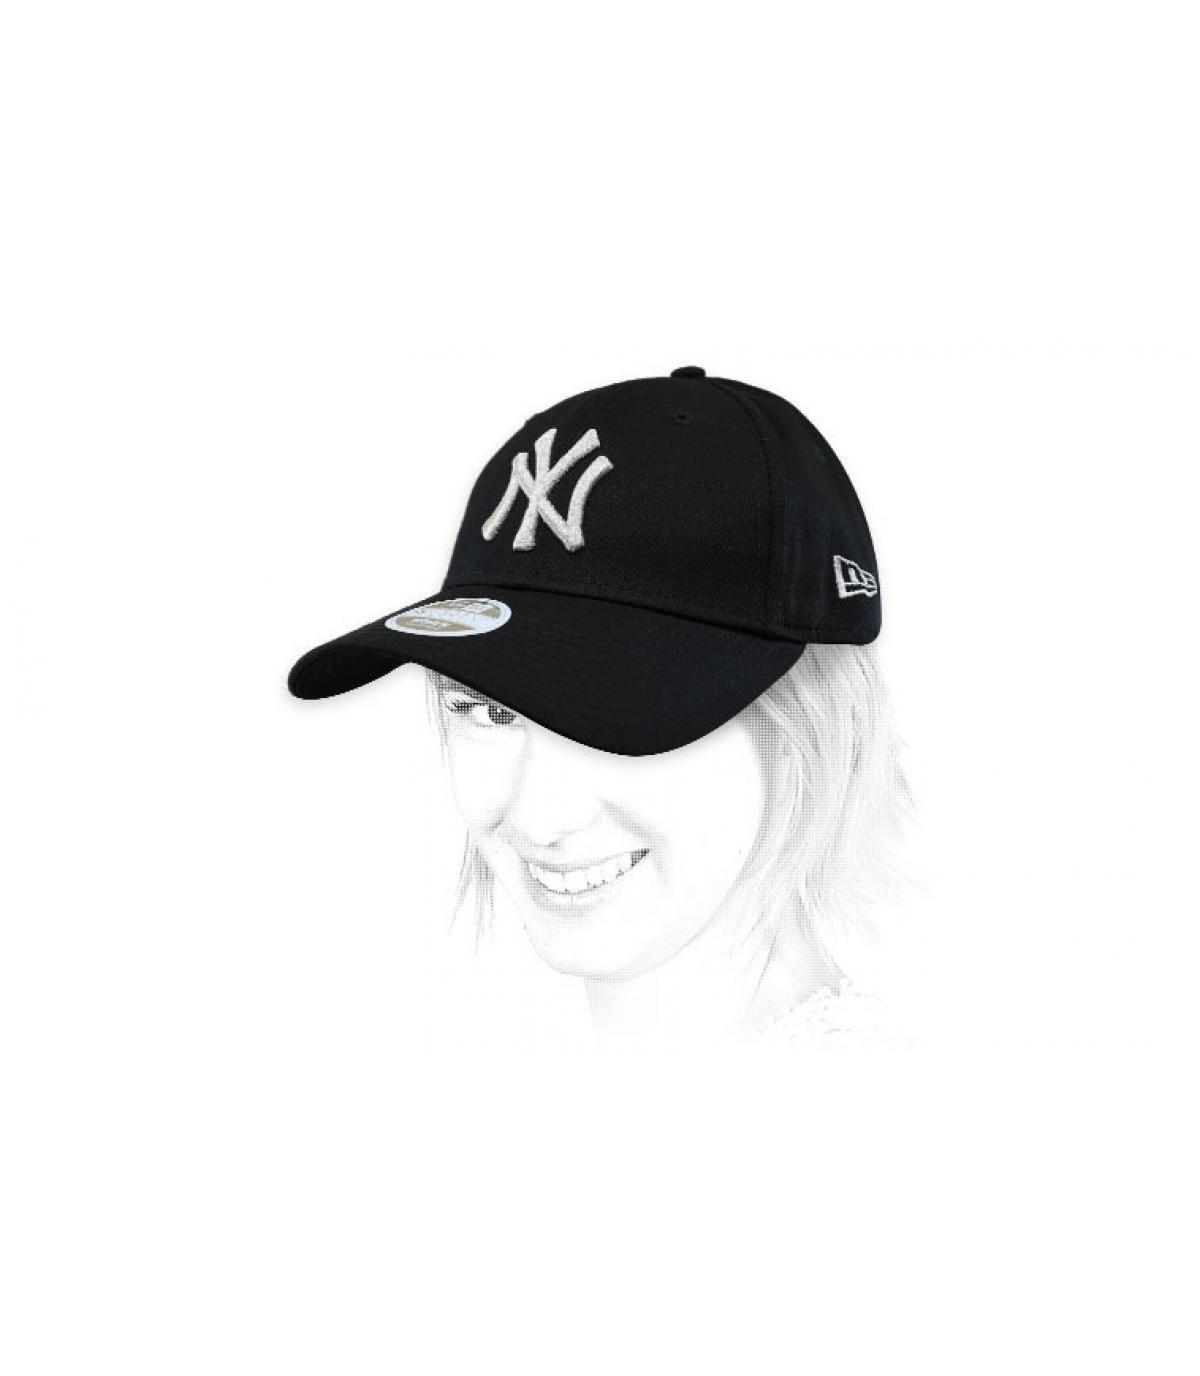 cappello donna NY nero argento